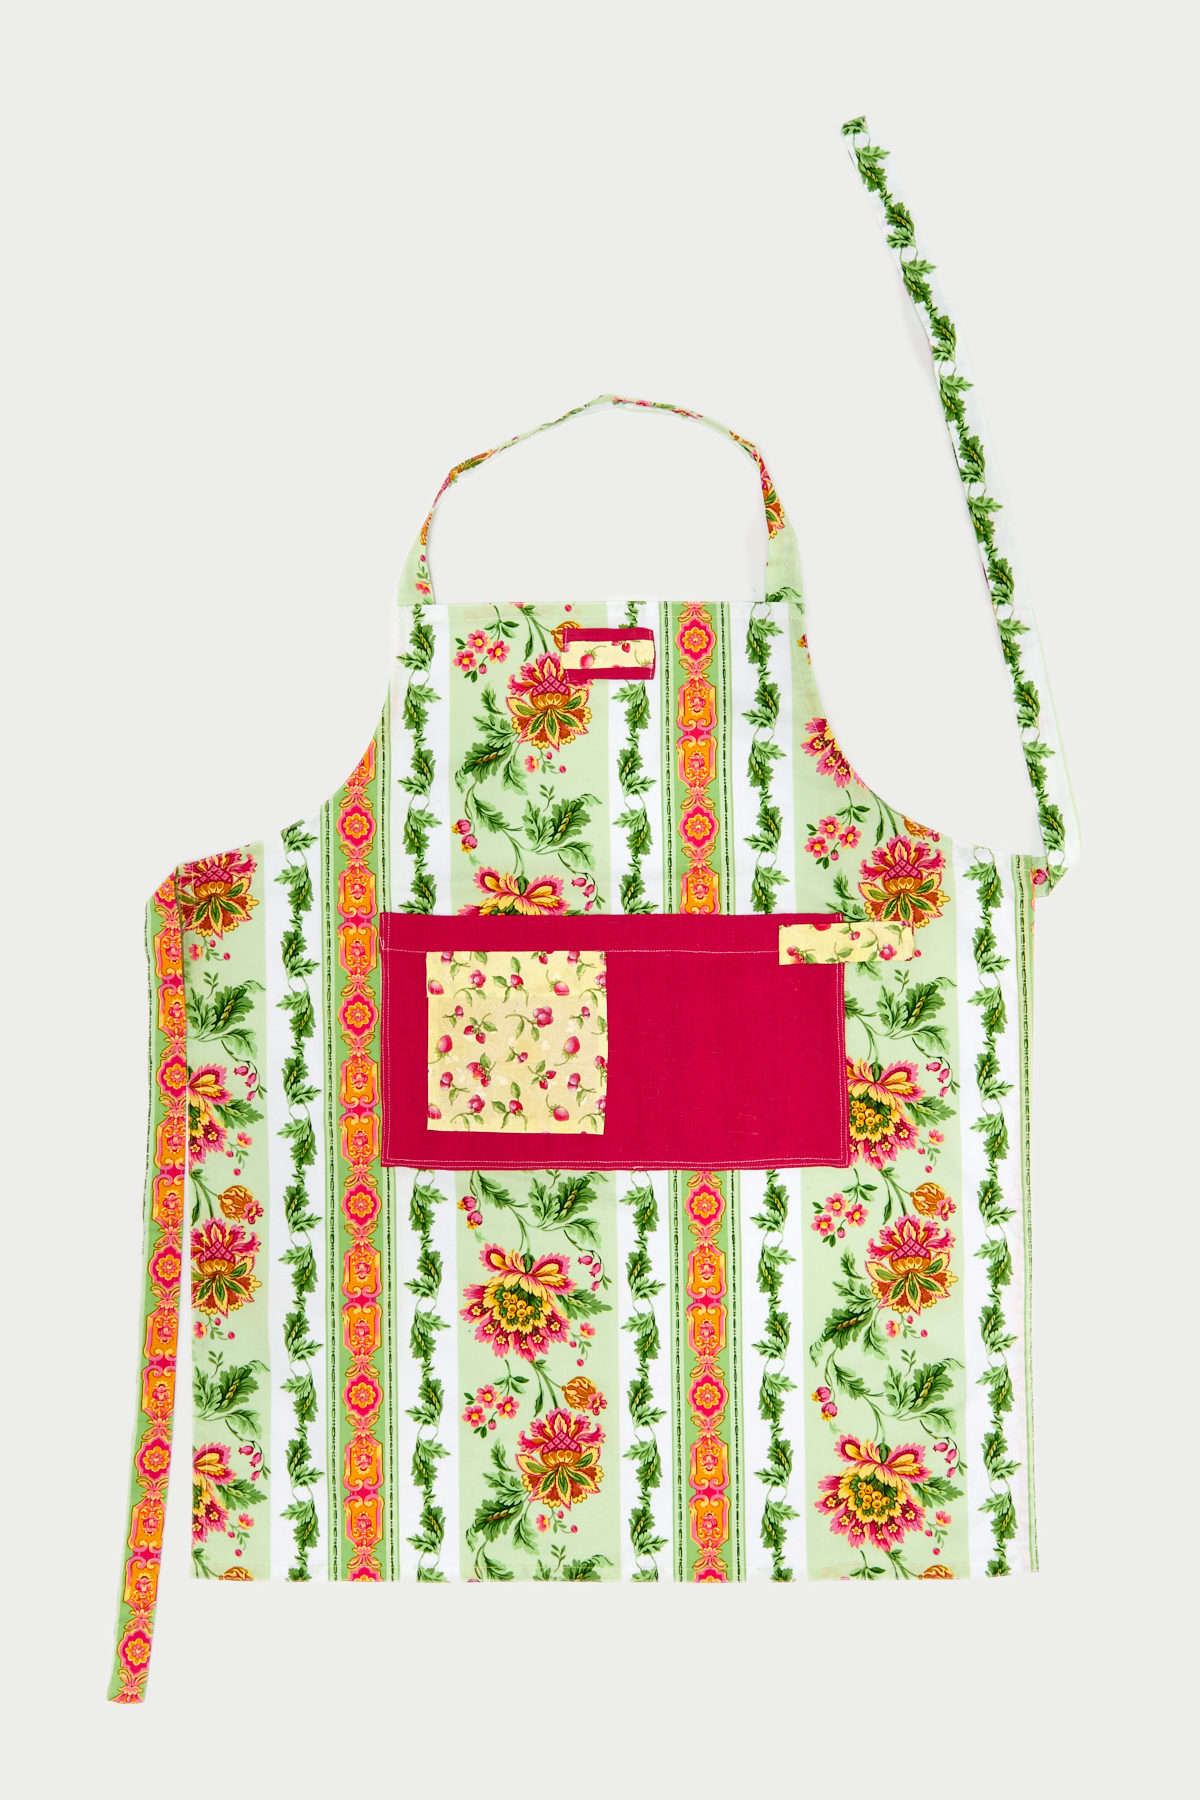 grembiule-apron-textiles-kitchen-tessili-da-cucina-impertinente.shop